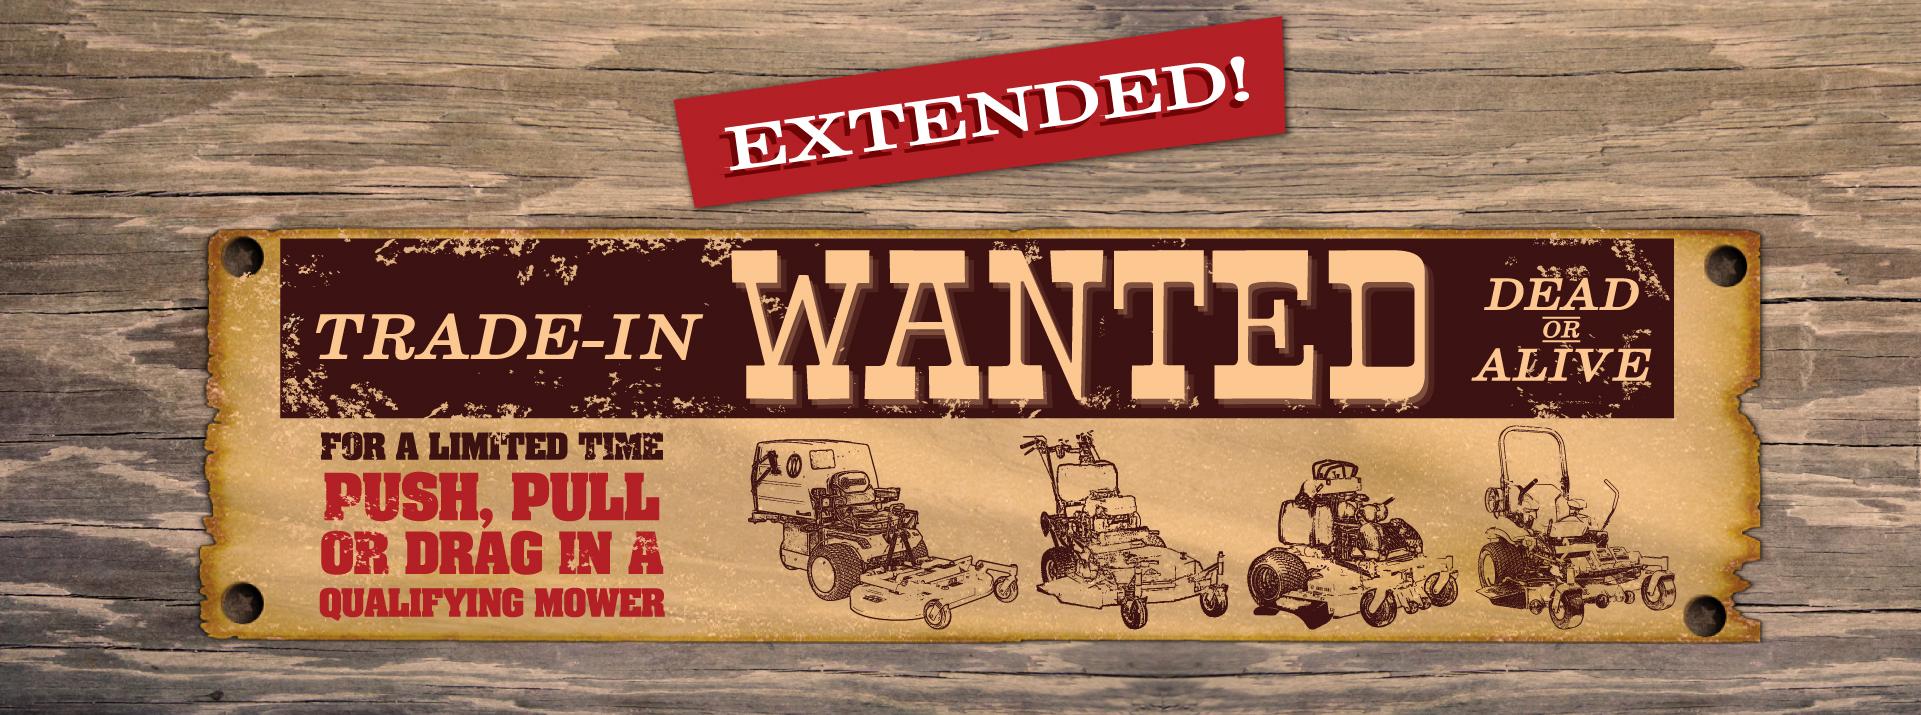 PWI160908-Bounty-Program-Web-Banner-Ad-01-01